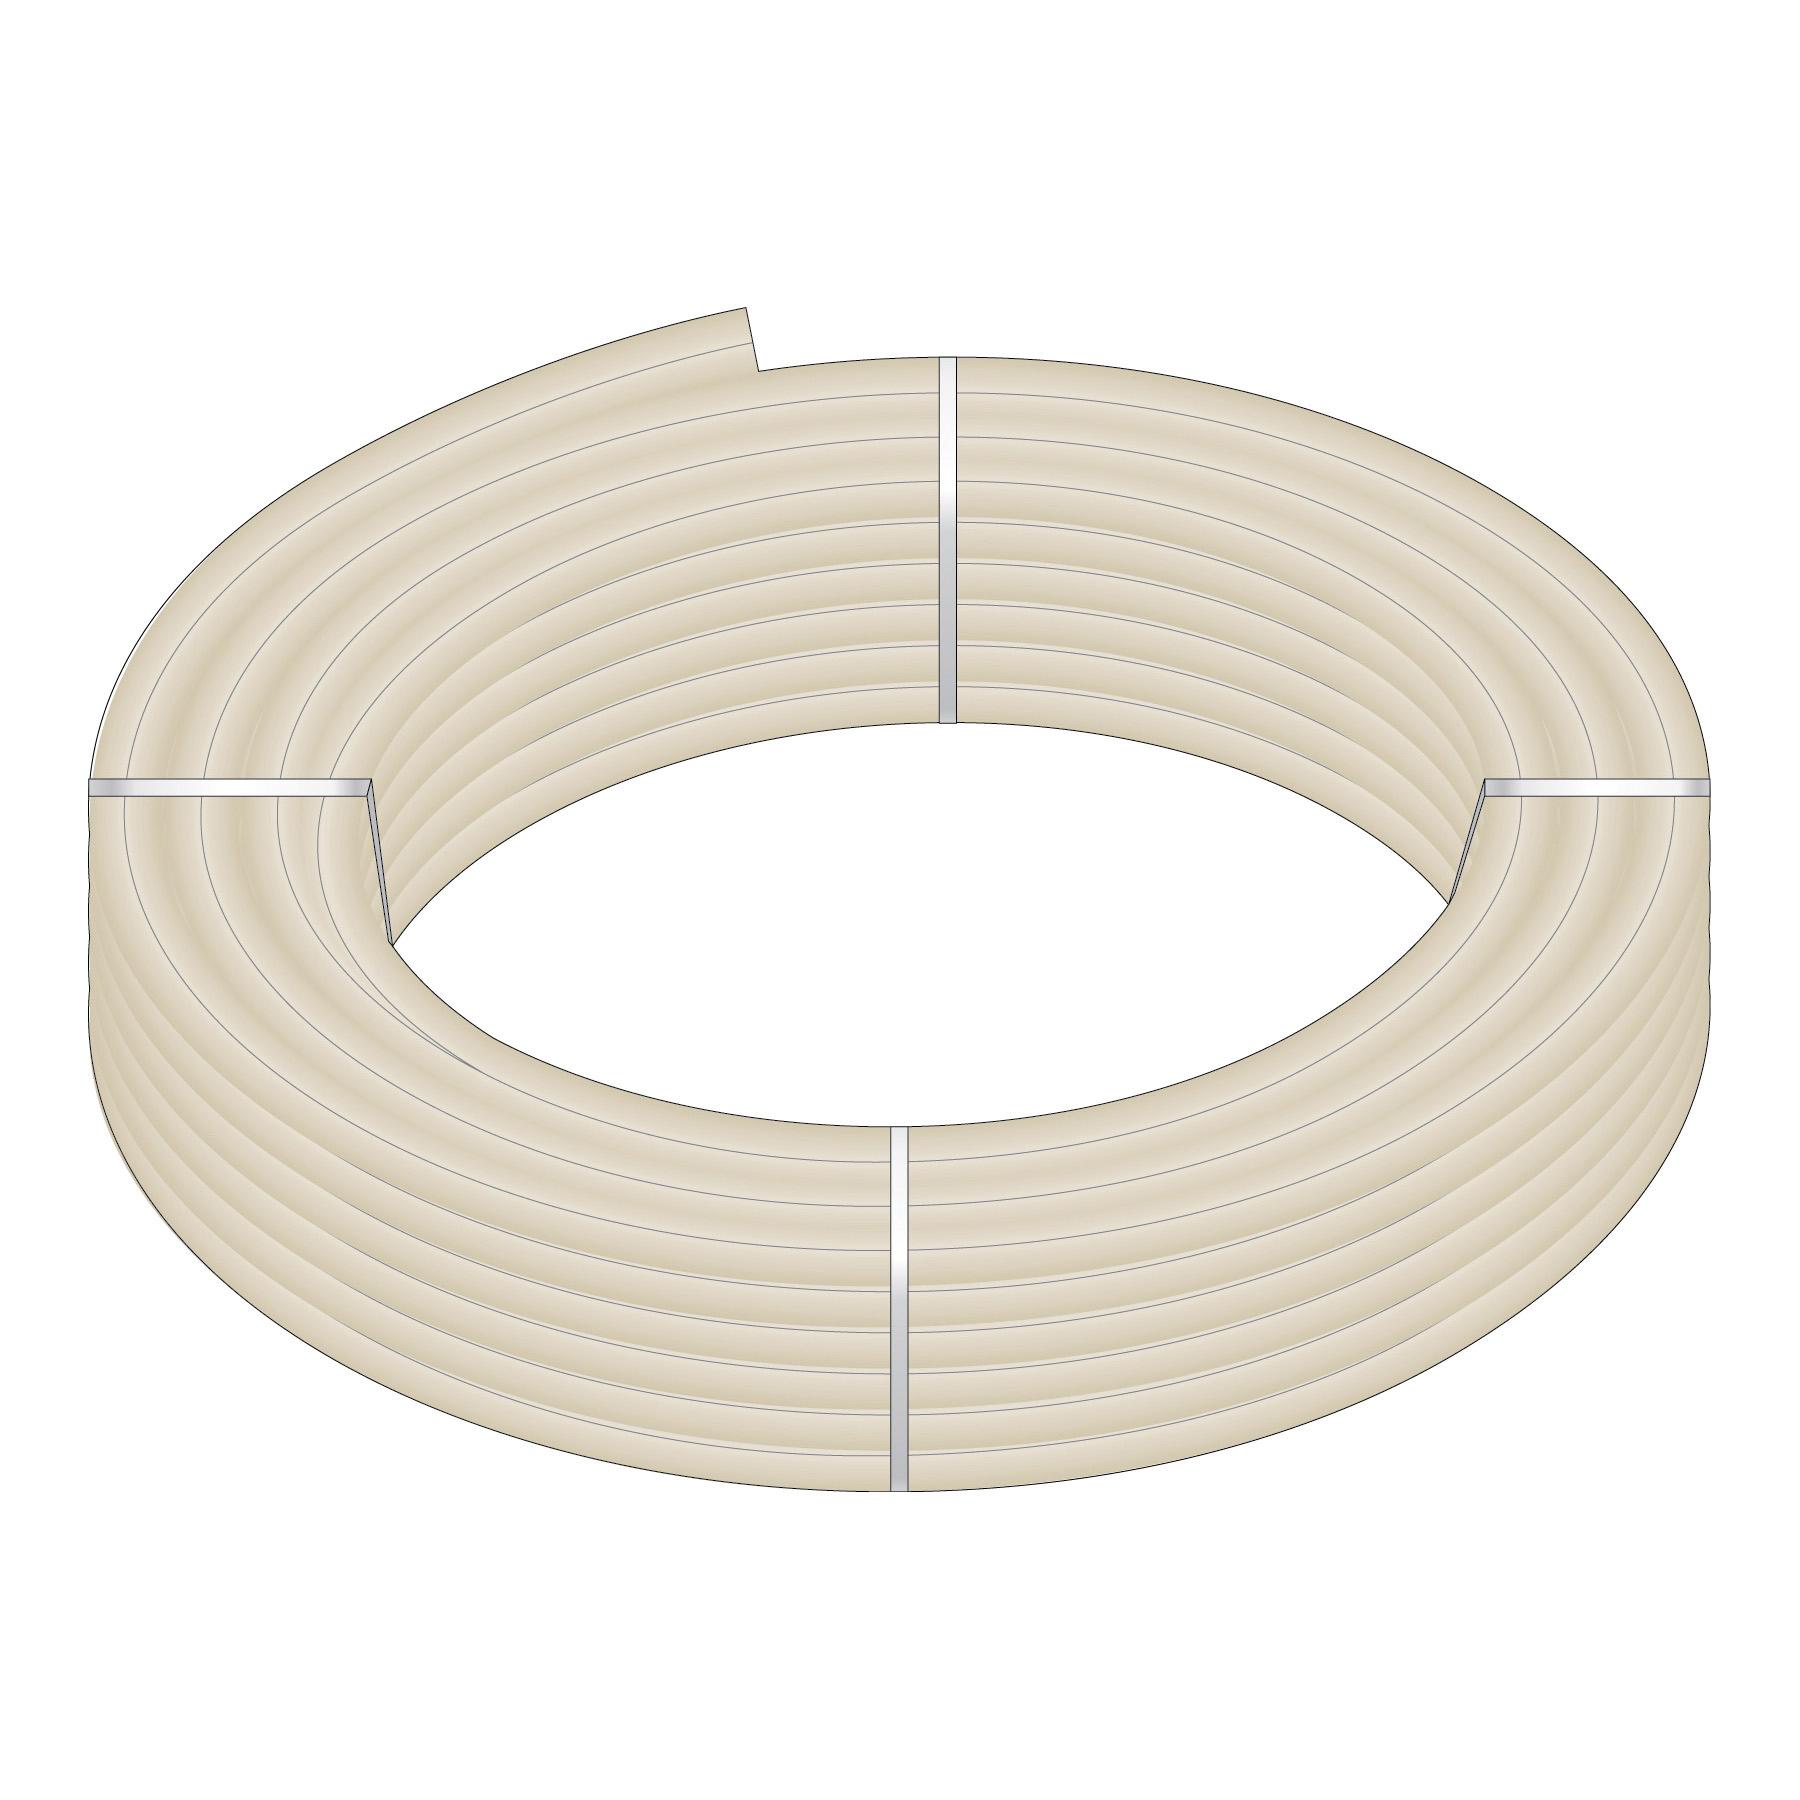 HeatLink® 20135 20000 UV Stabilized Plus Potable Water Tubing, 1-1/4 in Nominal, 1.054 in ID x 1-3/8 in OD x 100 ft Coil L, 0.153 in THK Wall, Natural/Black, Engel/Peroxide, Import